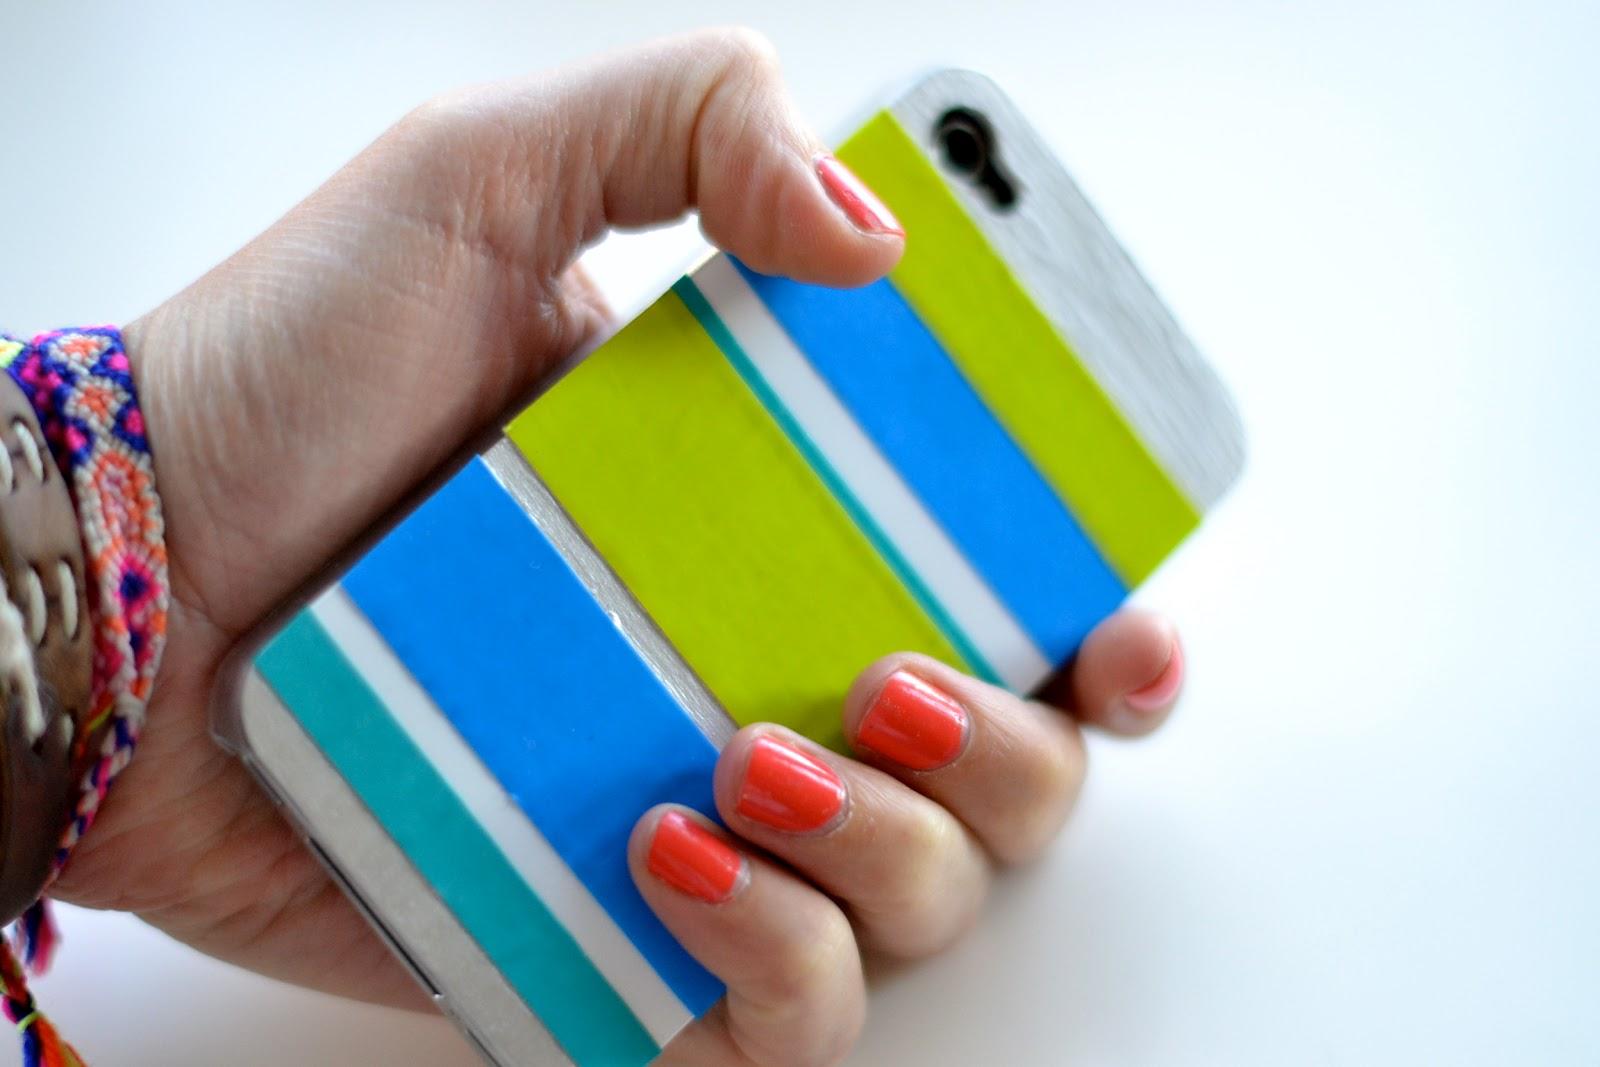 http://3.bp.blogspot.com/-ibZULkI7yfQ/UB9SYKg8T6I/AAAAAAAADfQ/zsZMtvDcN9E/s1600/diy_iphone_case.JPG